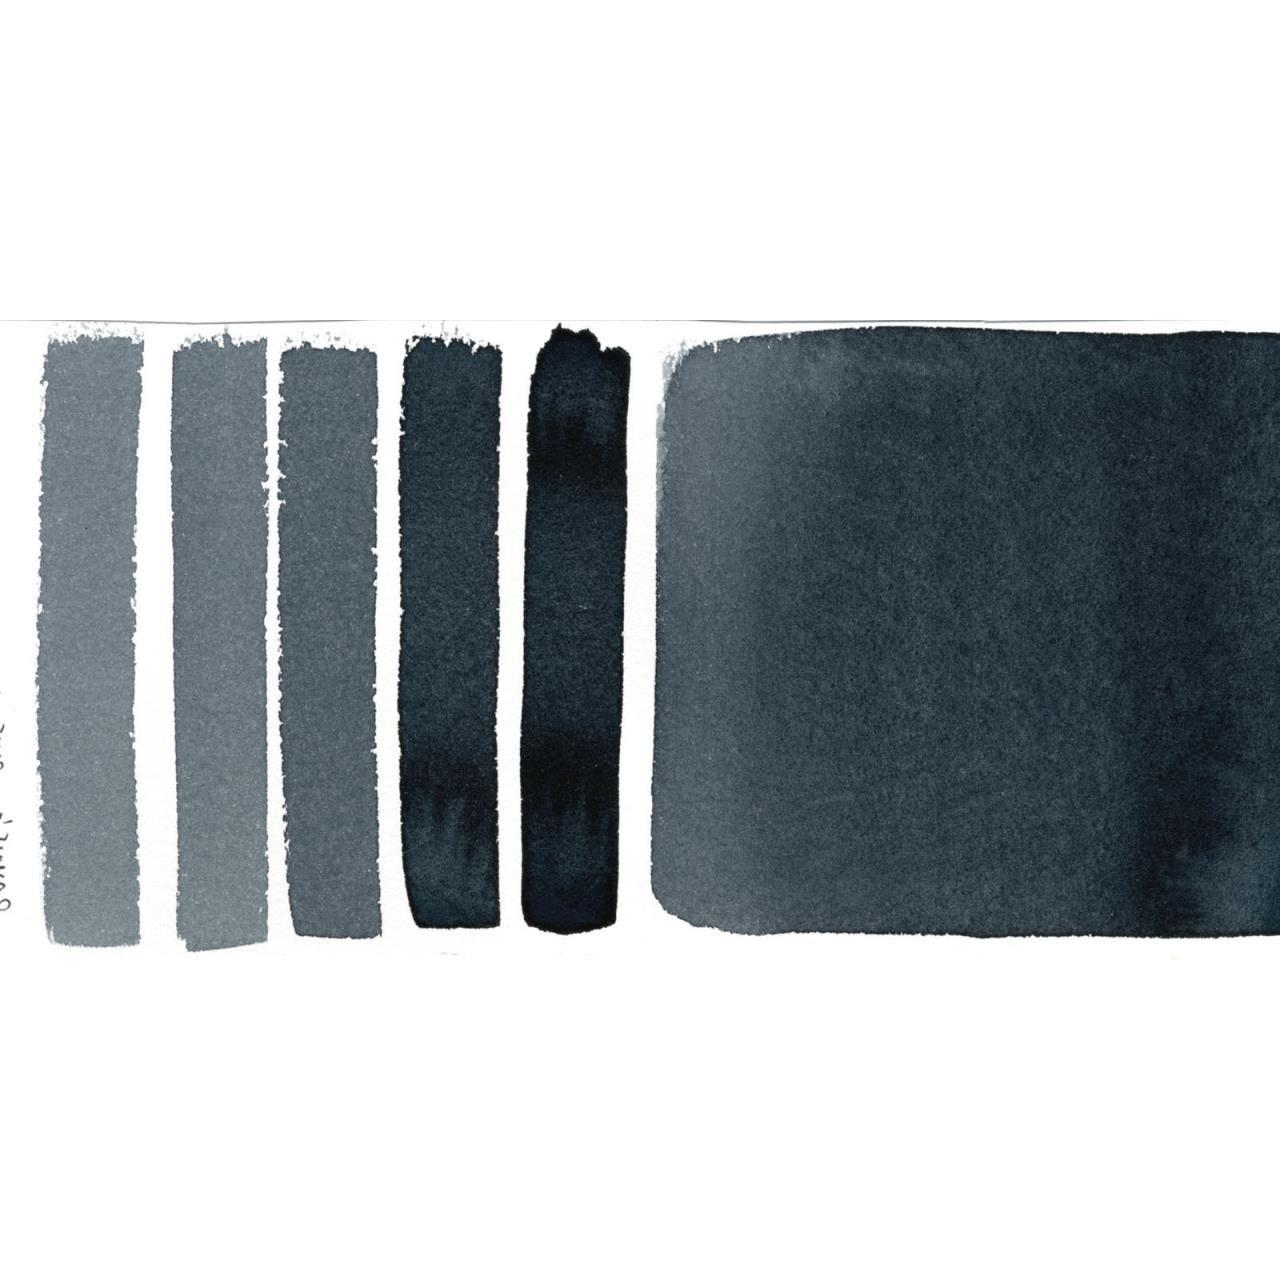 Payne's Blue Gray, DANIEL SMITH Extra Fine Watercolors 15ml Tubes - 743162033379